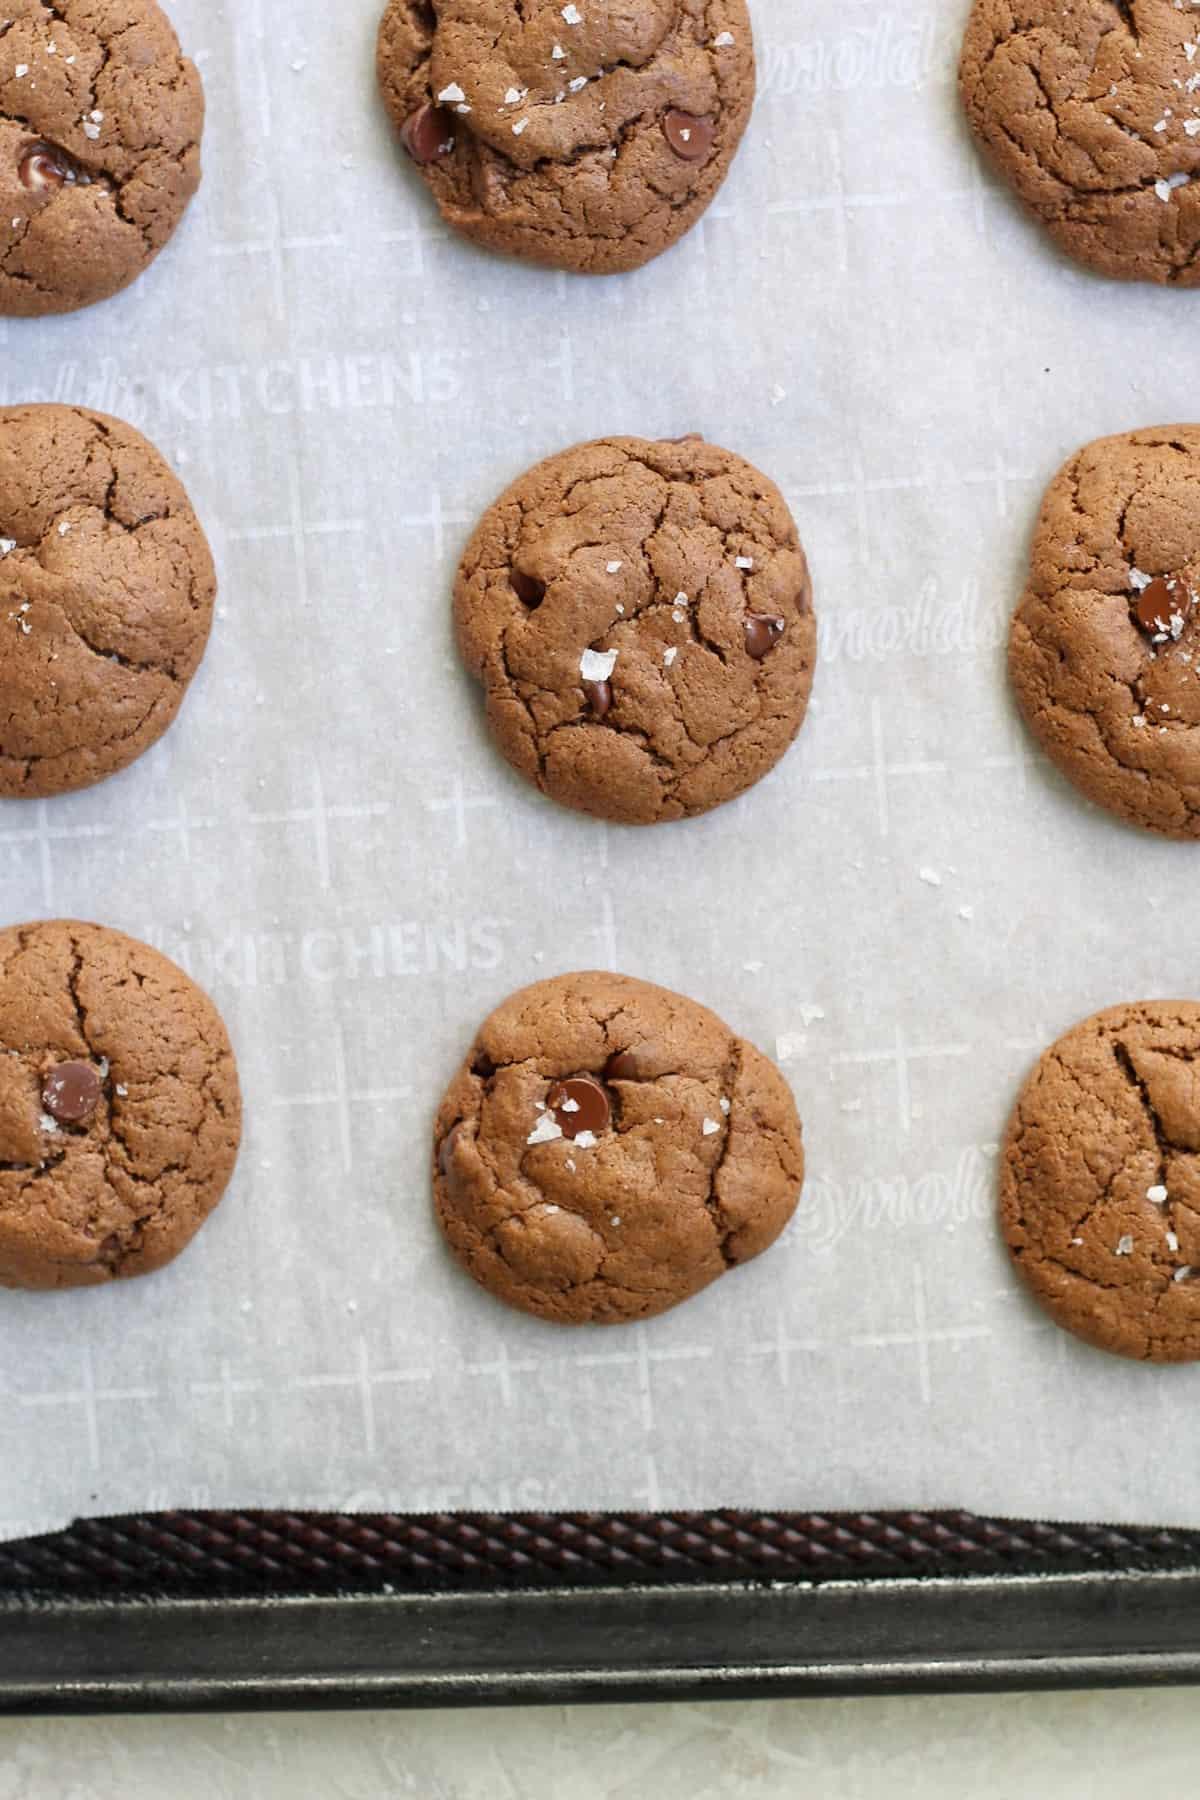 sheet pan of chocolate cookies with salt